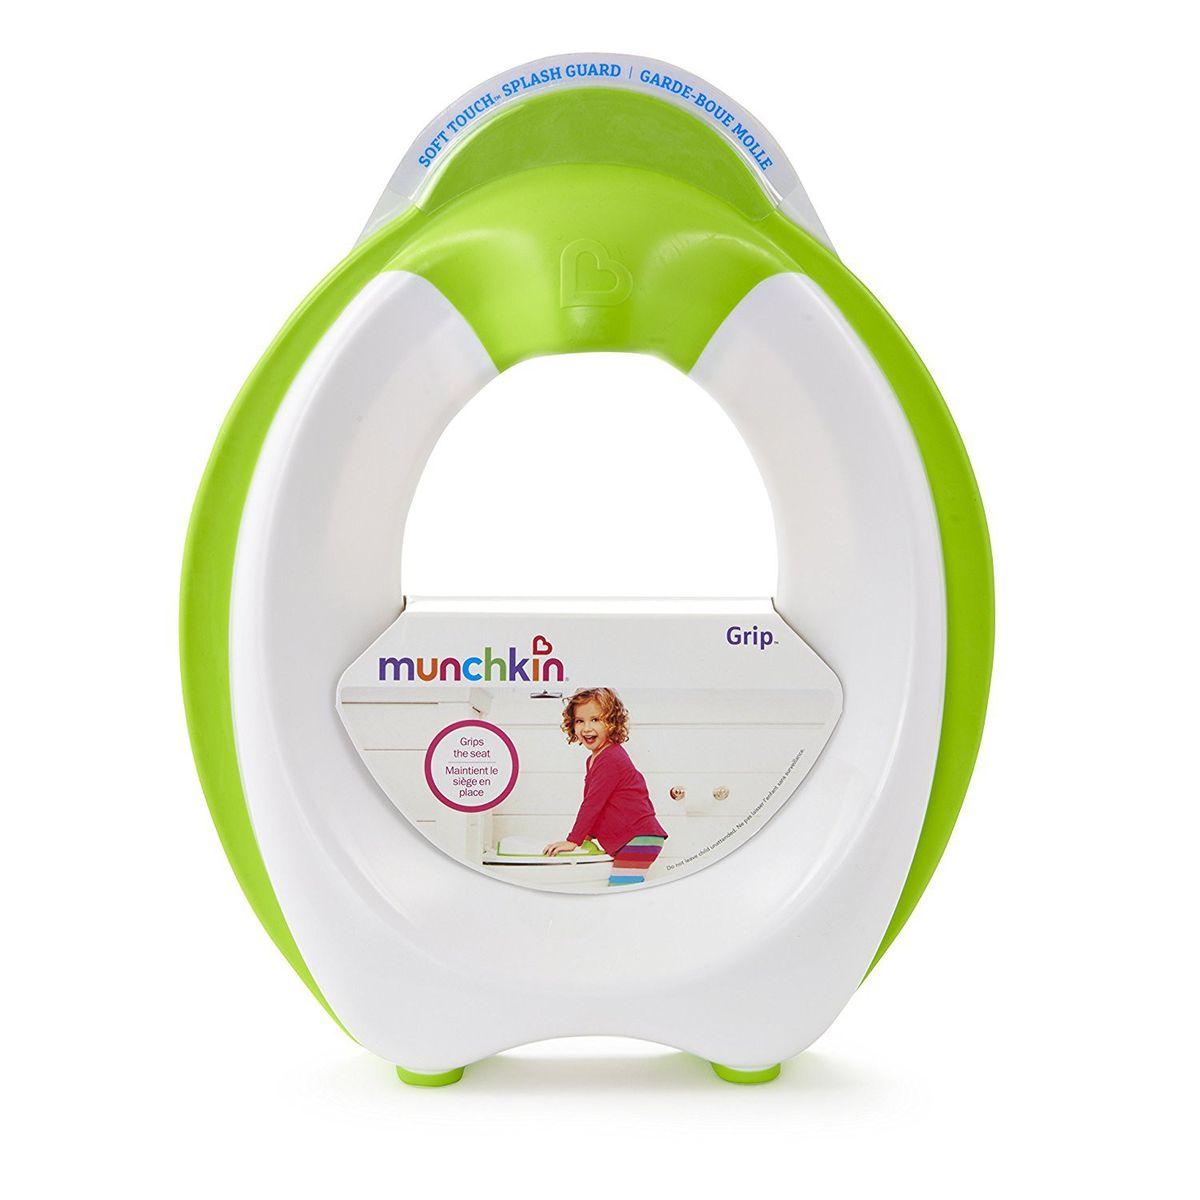 Munchkin Grip Potty Training Seat - Walmart.com